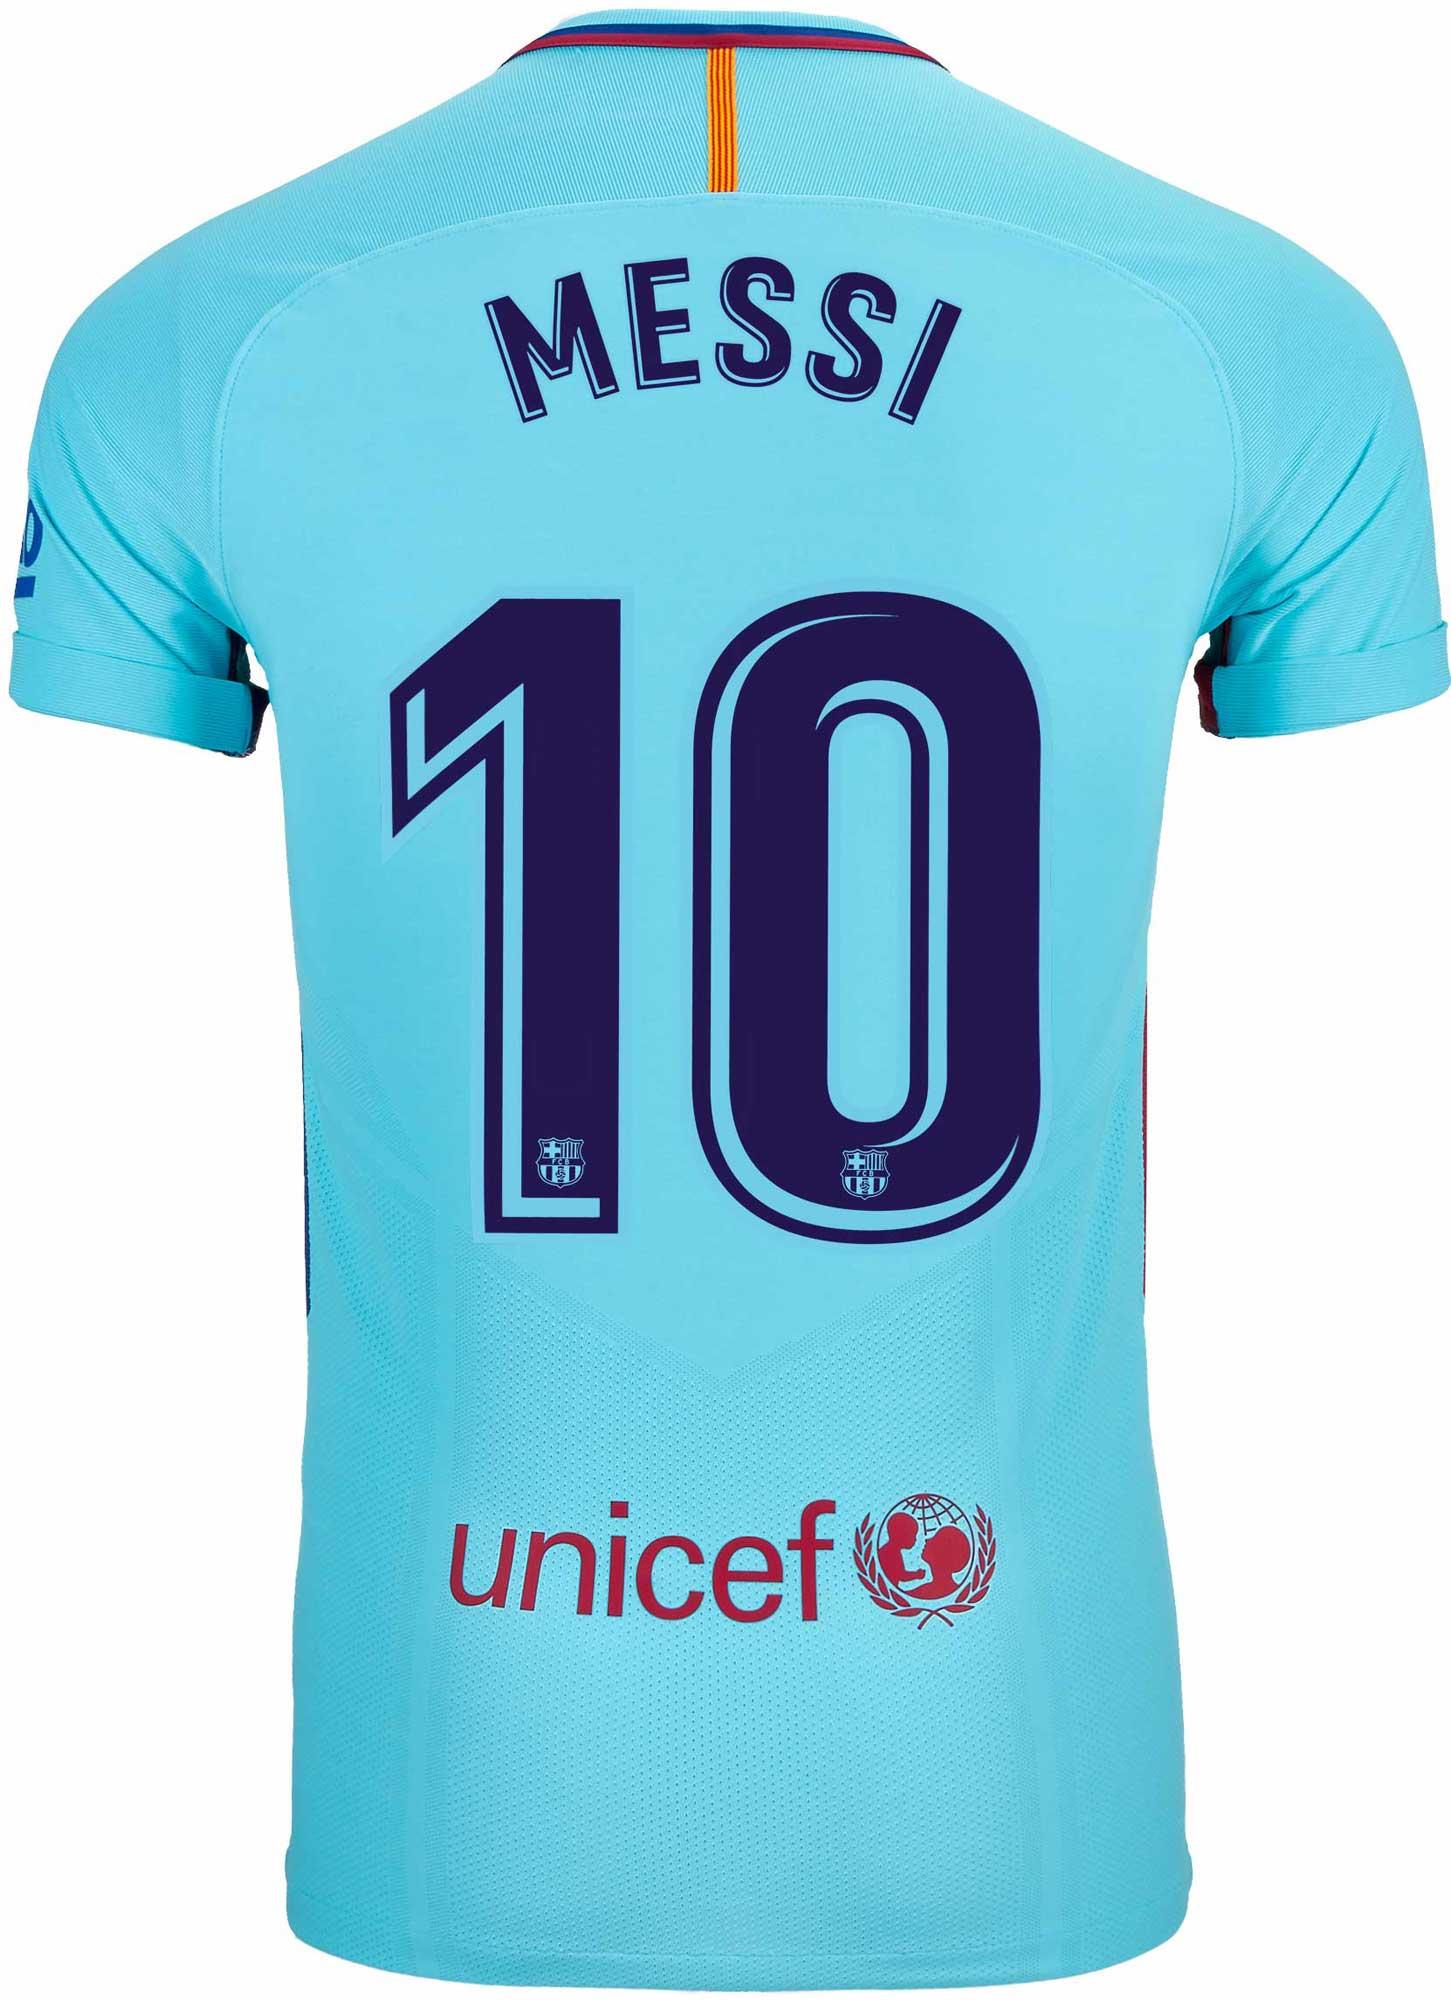 8886f1834c5 Nike Lionel Messi Barcelona Away Match Jersey 2017-18